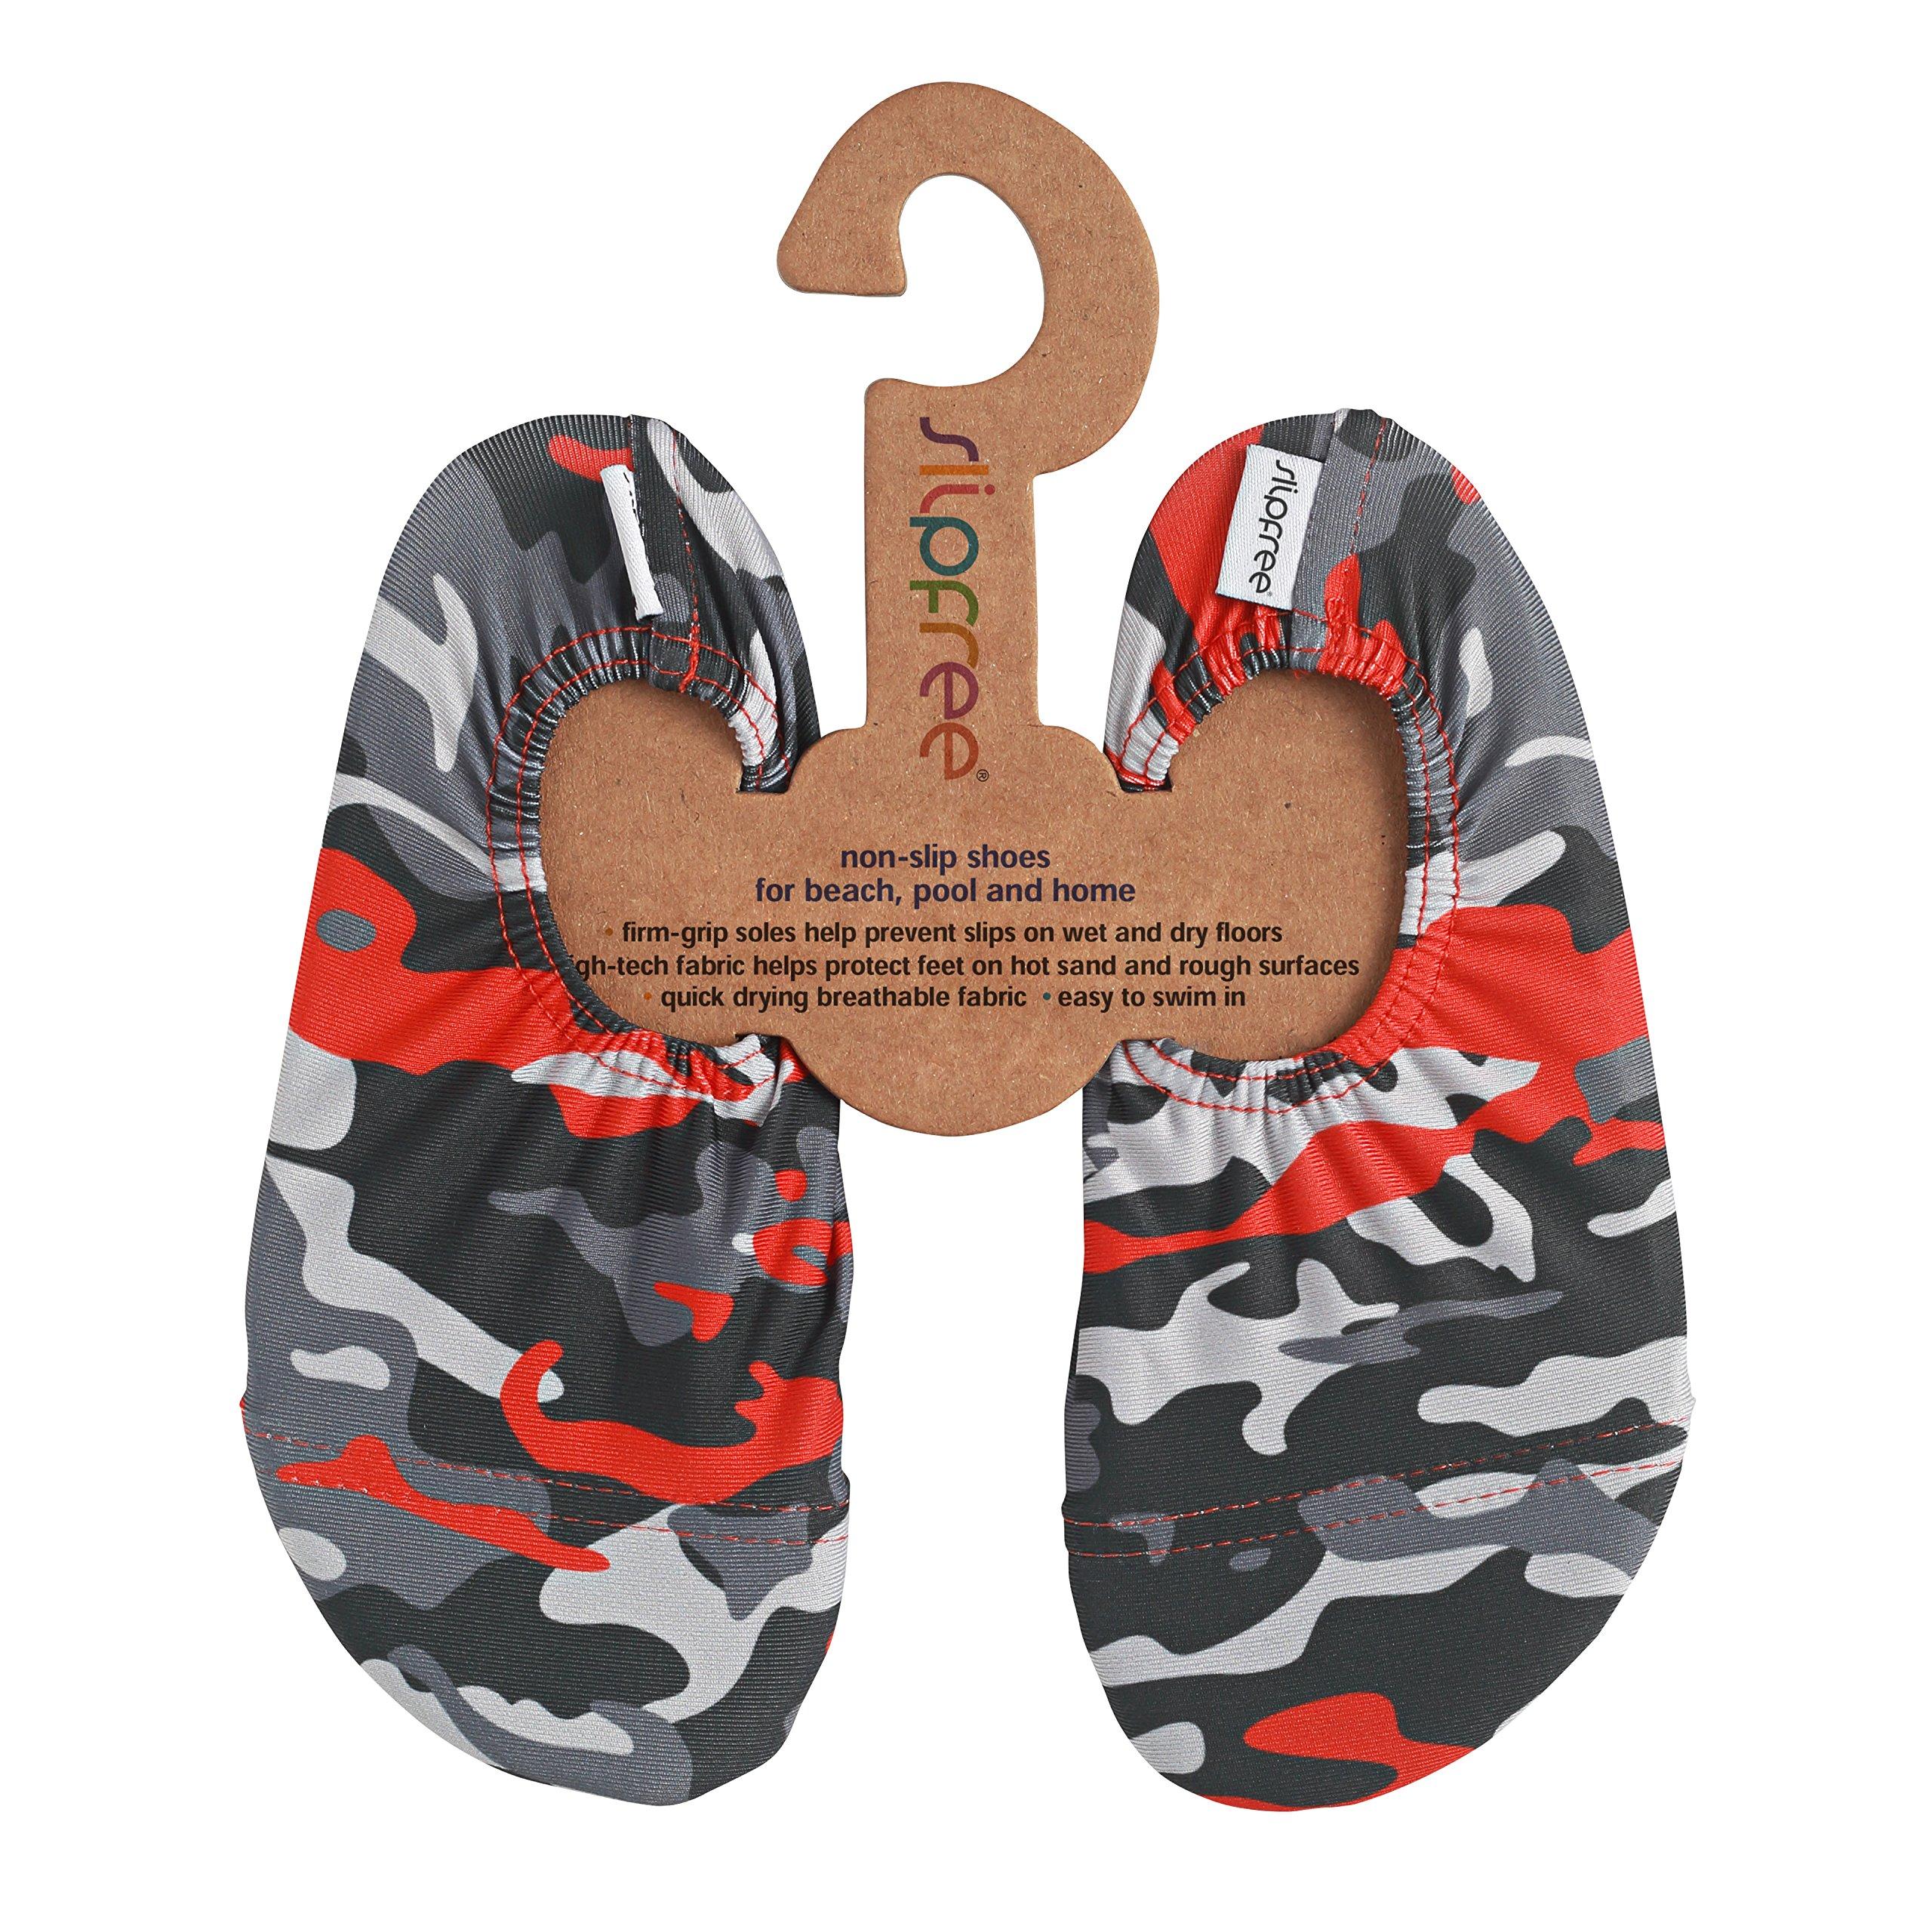 Slipfree Water & Multi Use Shoes for Beach, Pool, Home, School, Gym, Boat, Kindergarten, Travel (Medium, Desert Camu)